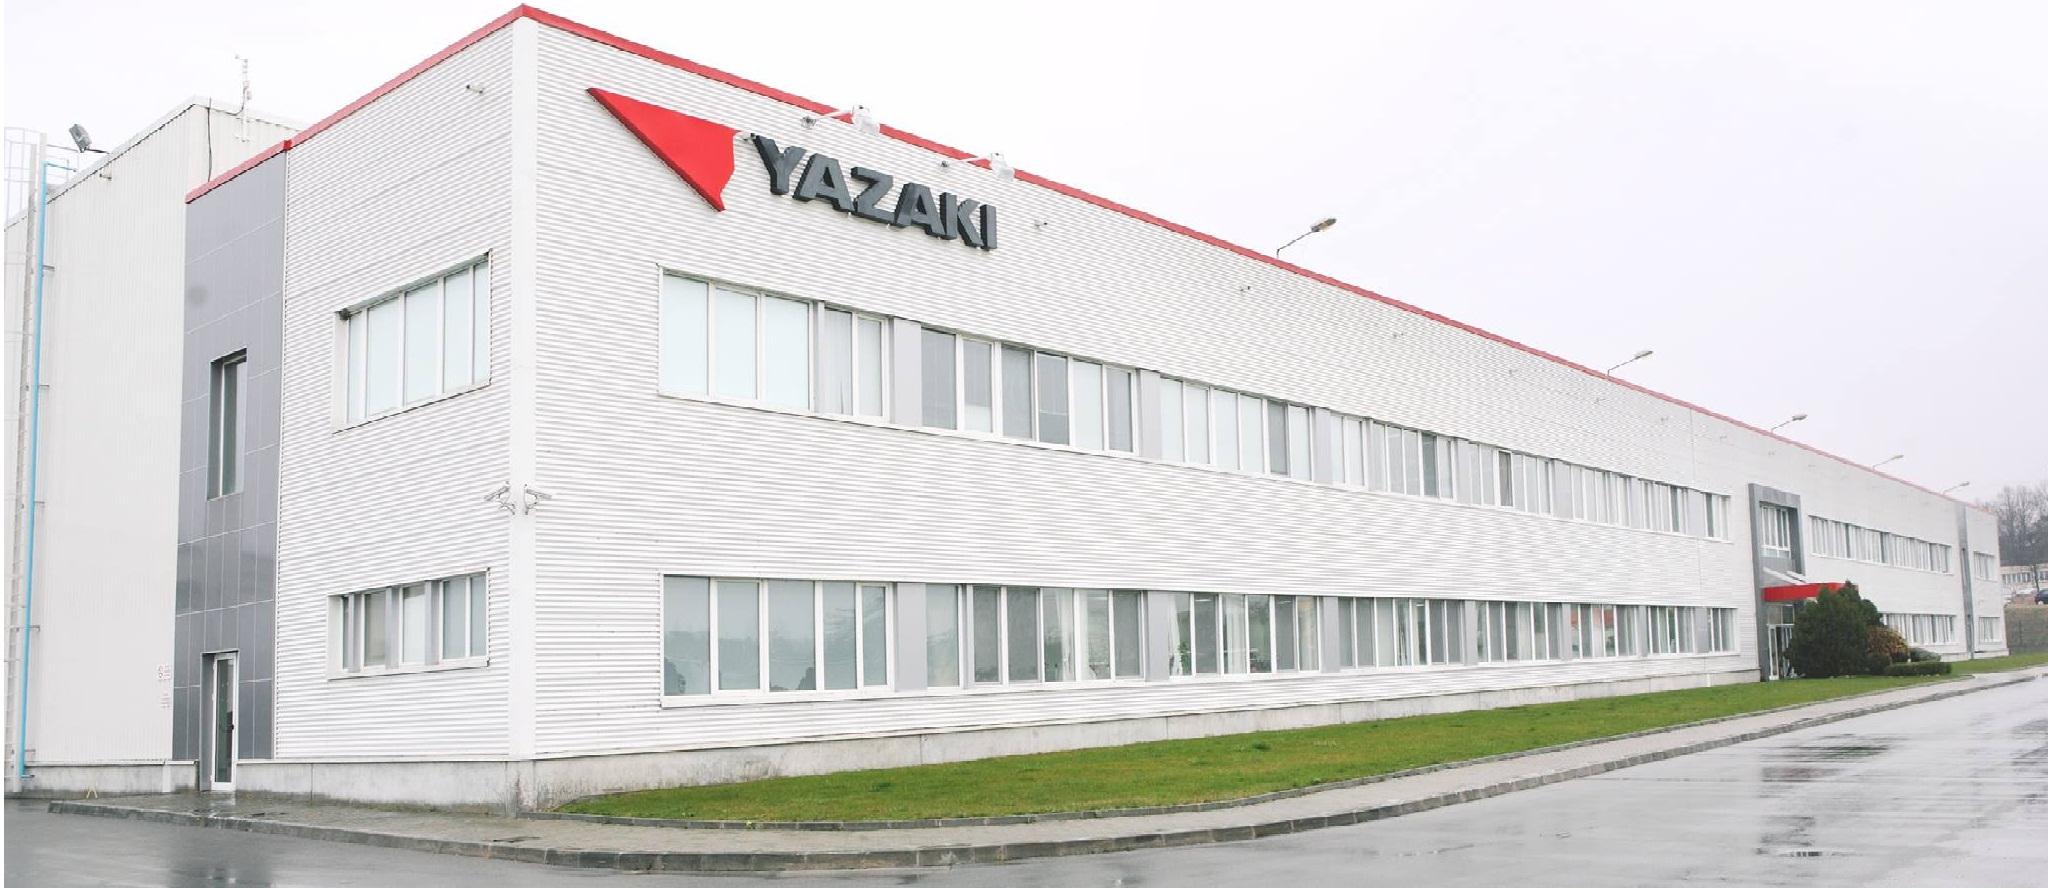 Yazaki to open car parts plant in Serbia - econ min